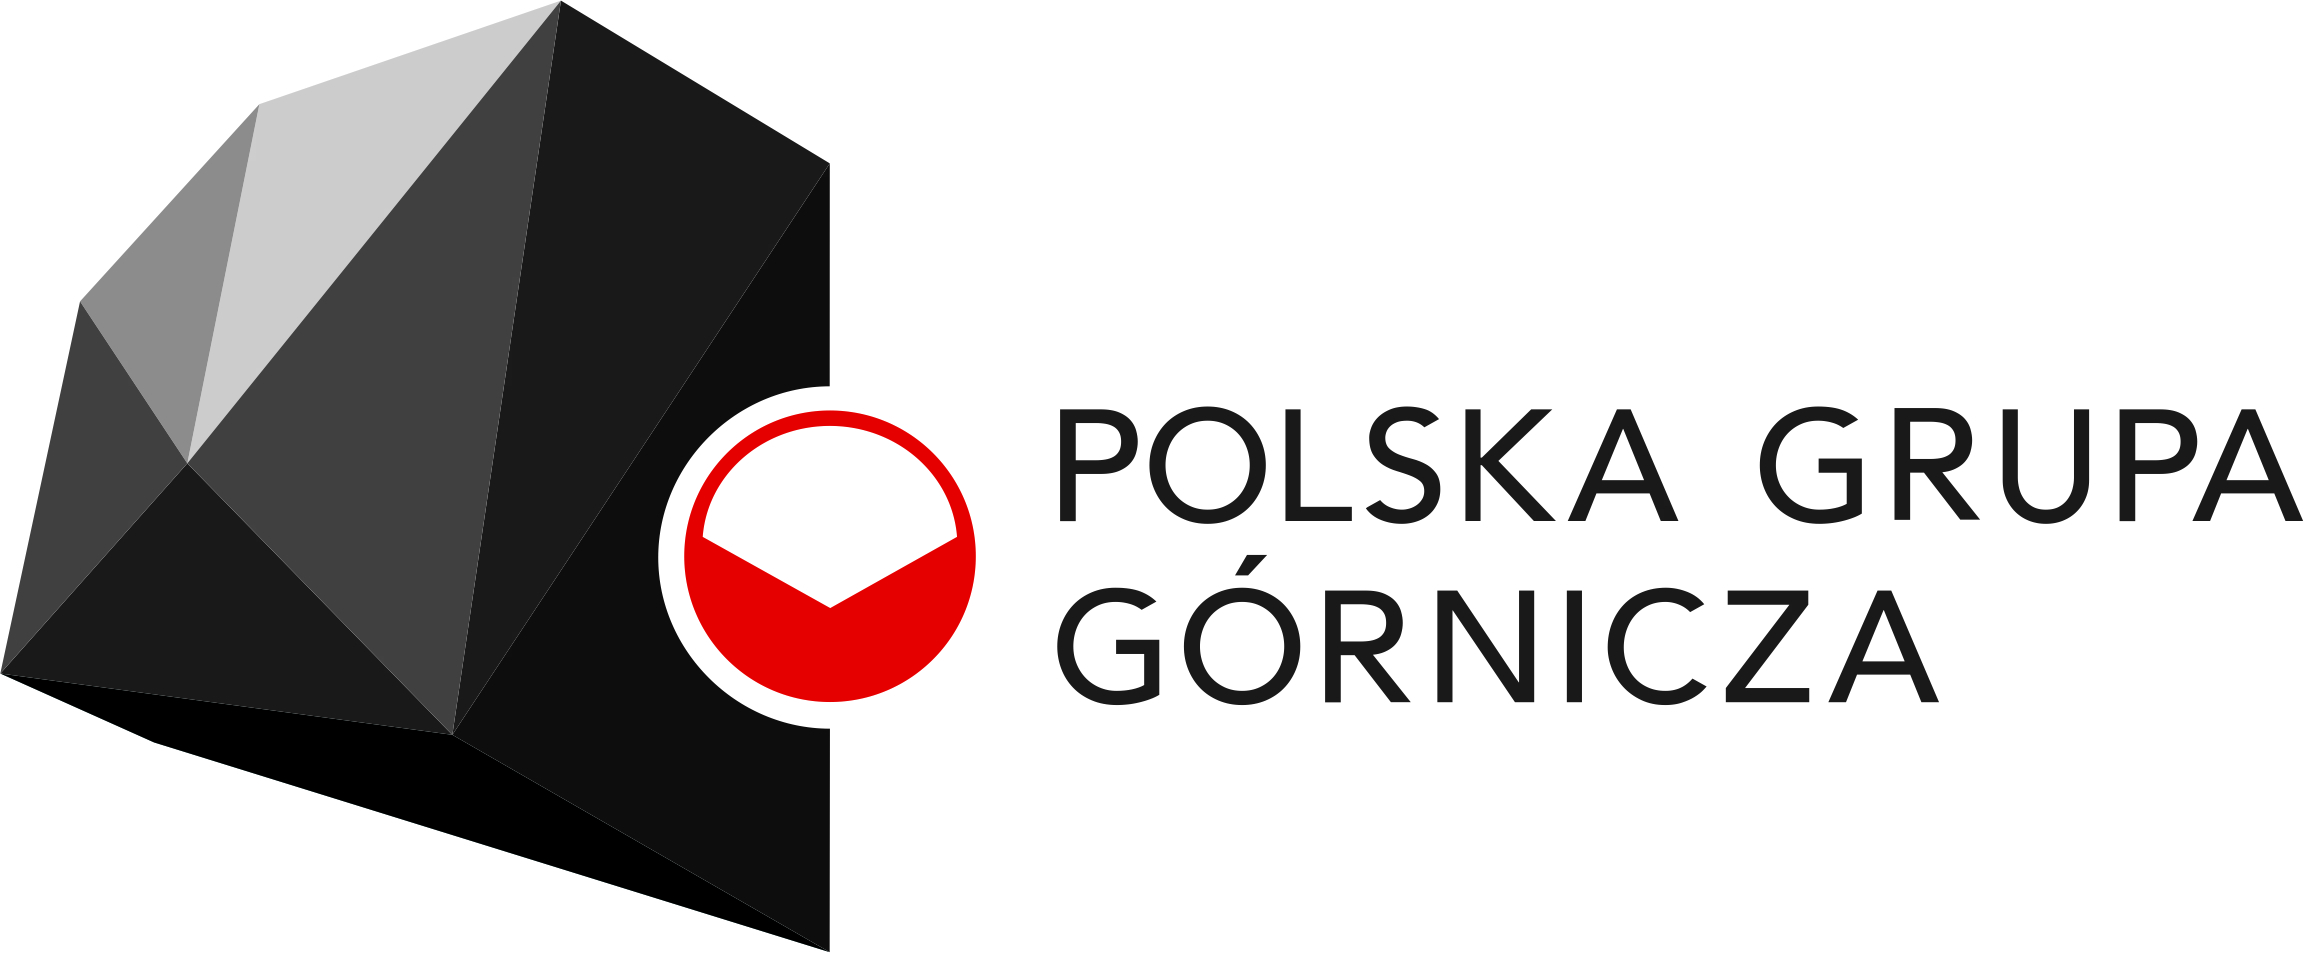 Logo Polska Grupa Górnicza sp. z o.o.